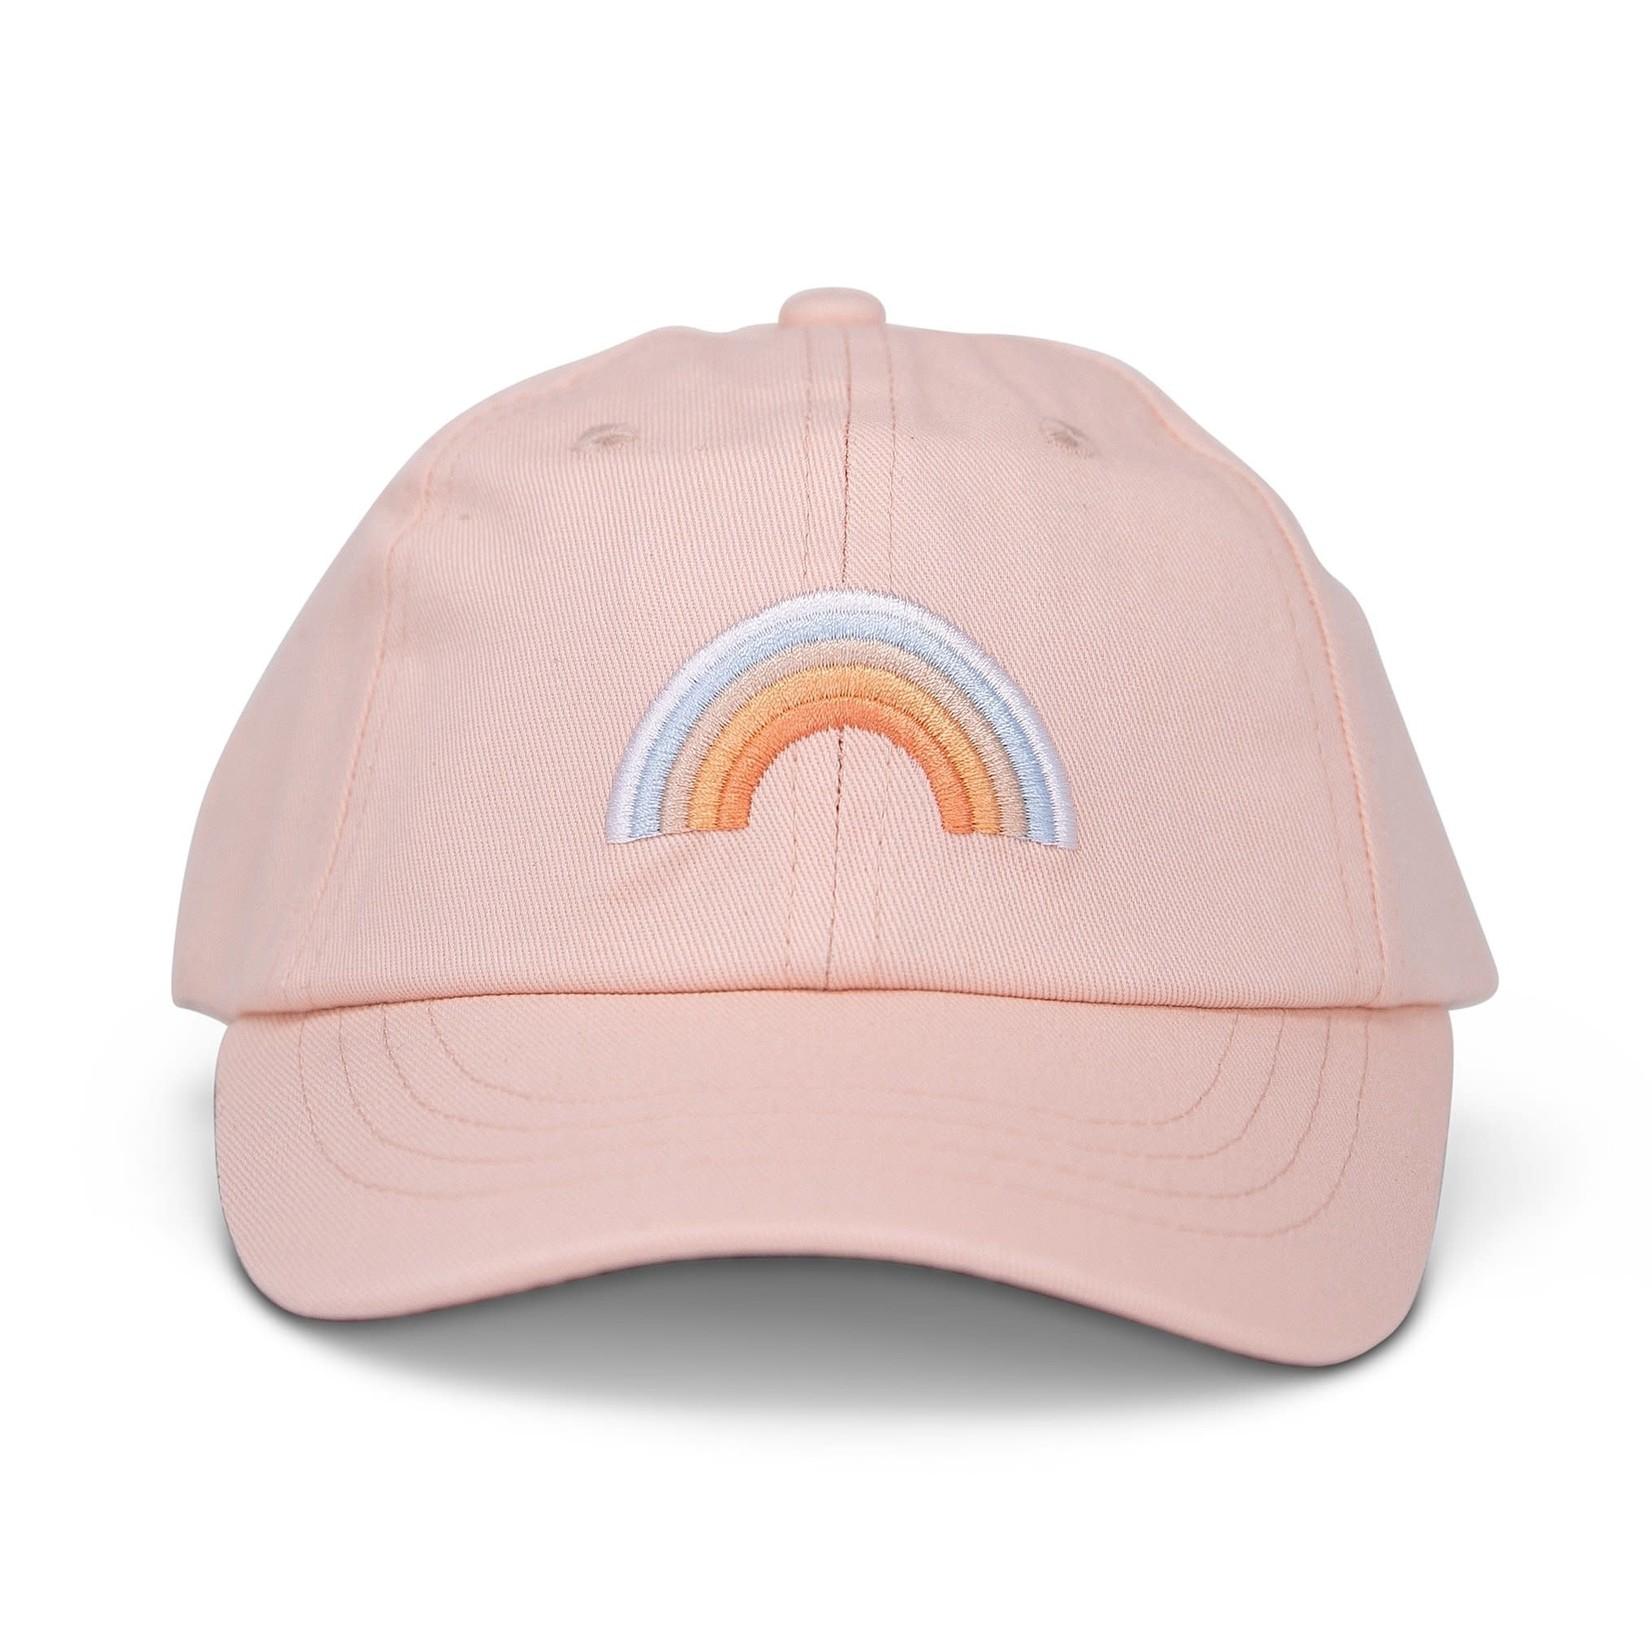 Cash & Co Blushing Rainbow Hat